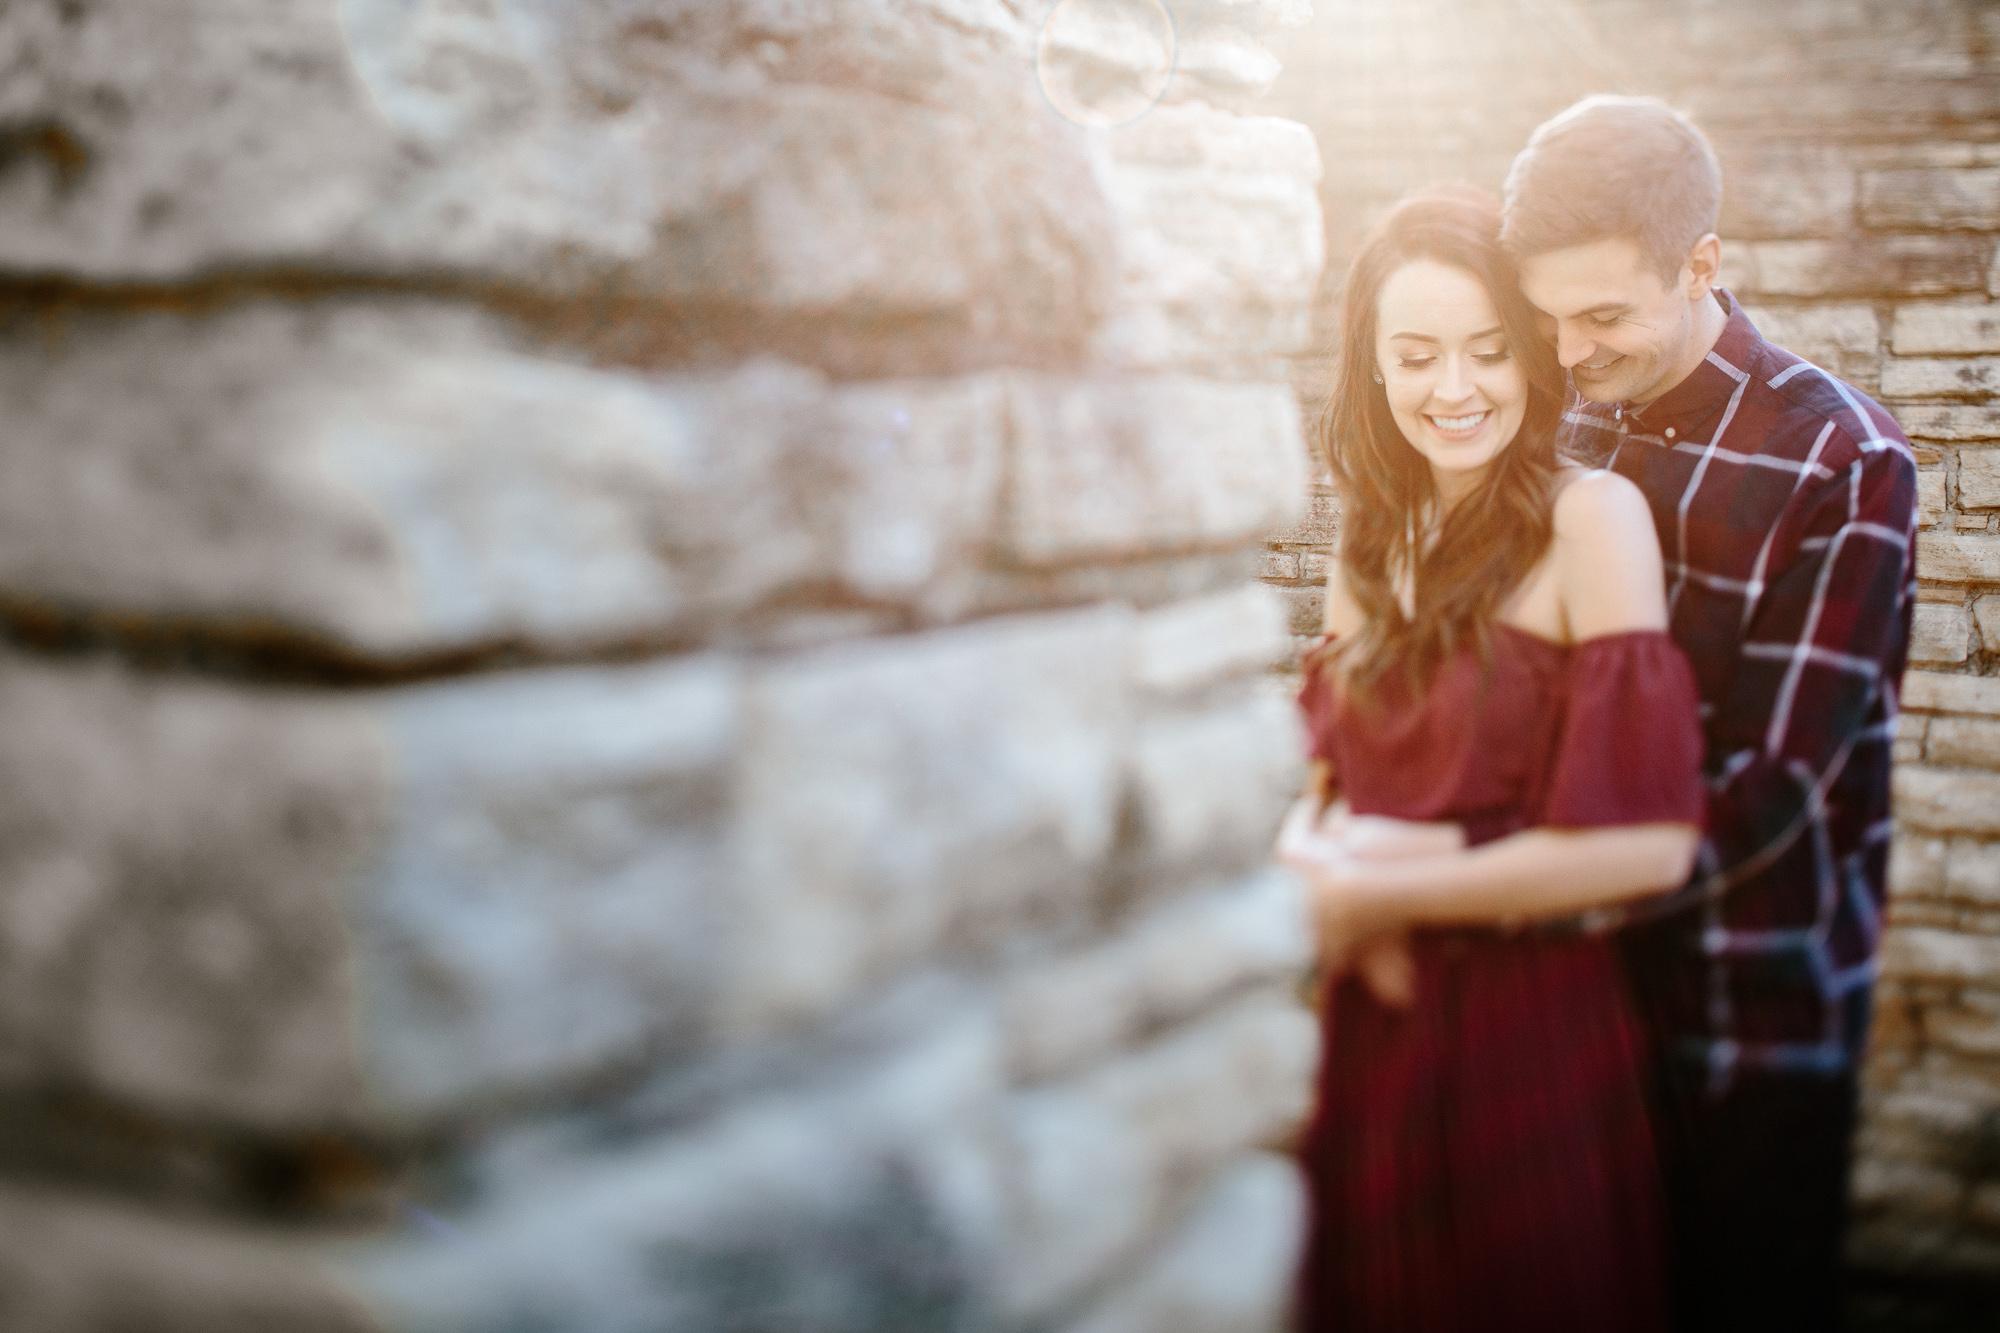 wedding-elopement-adventerous-romantic-timeless-des-moines-siouxfalls-photography-15.jpg